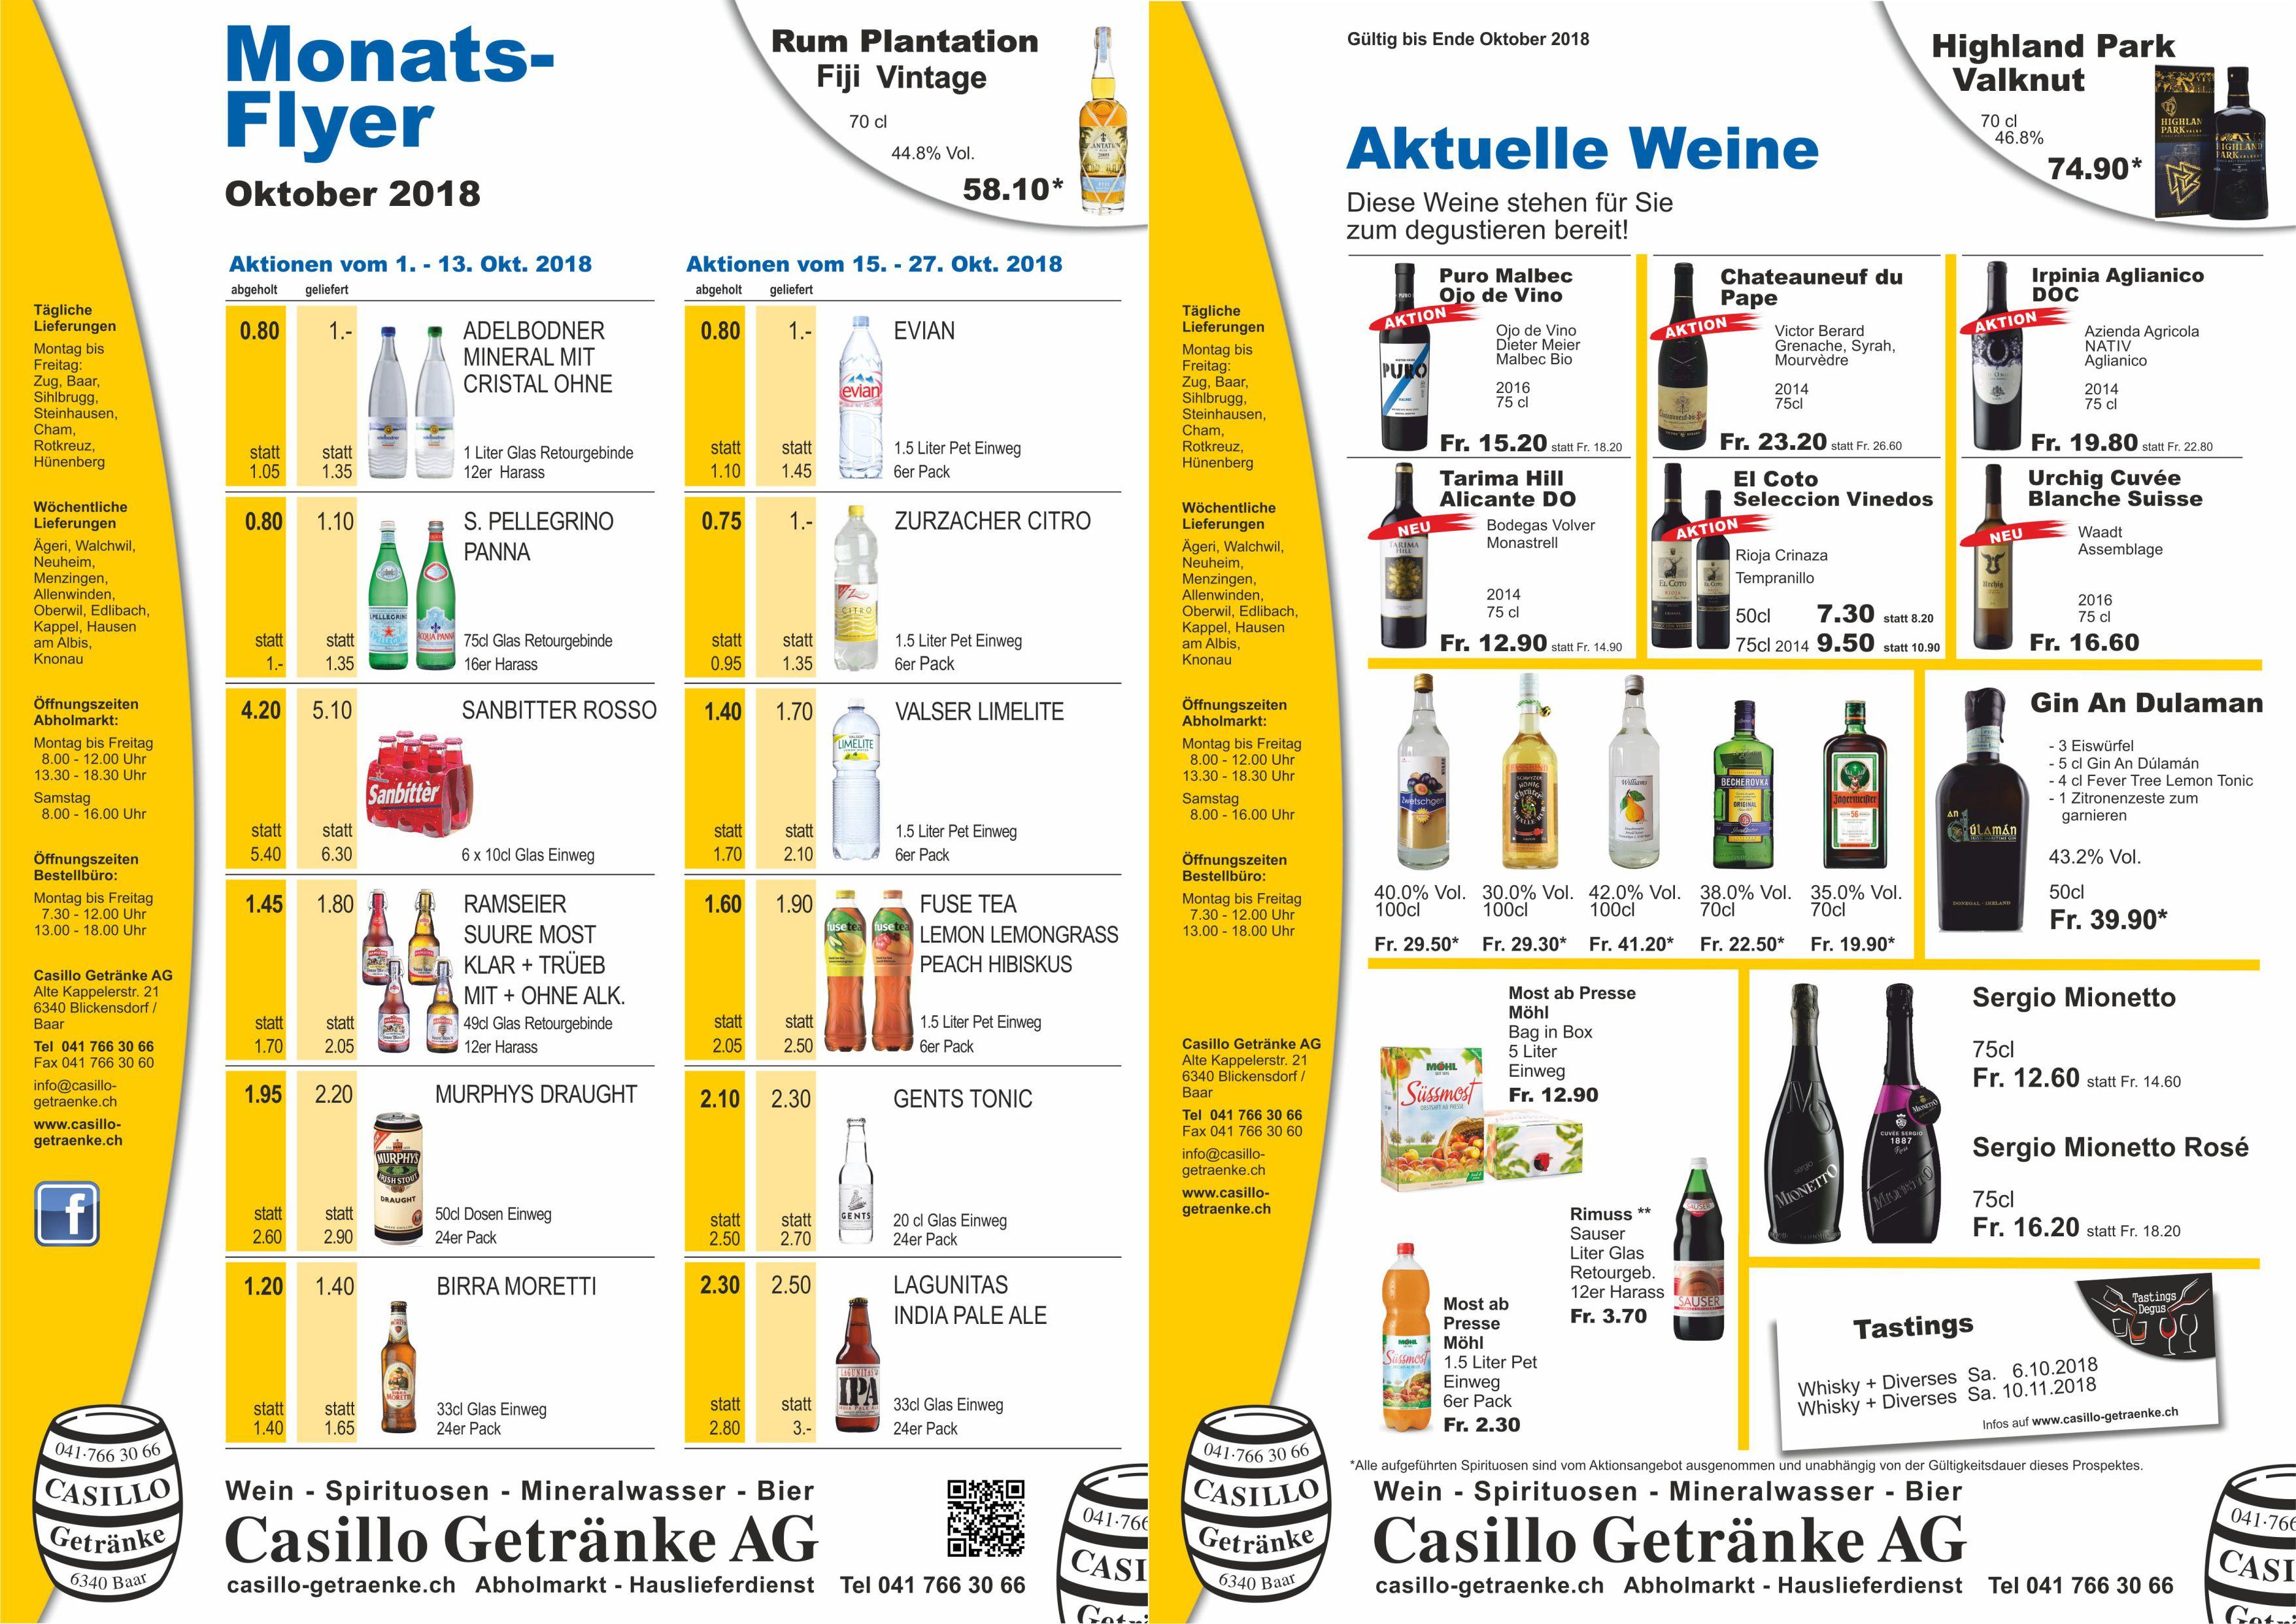 Casillo Getränke AG